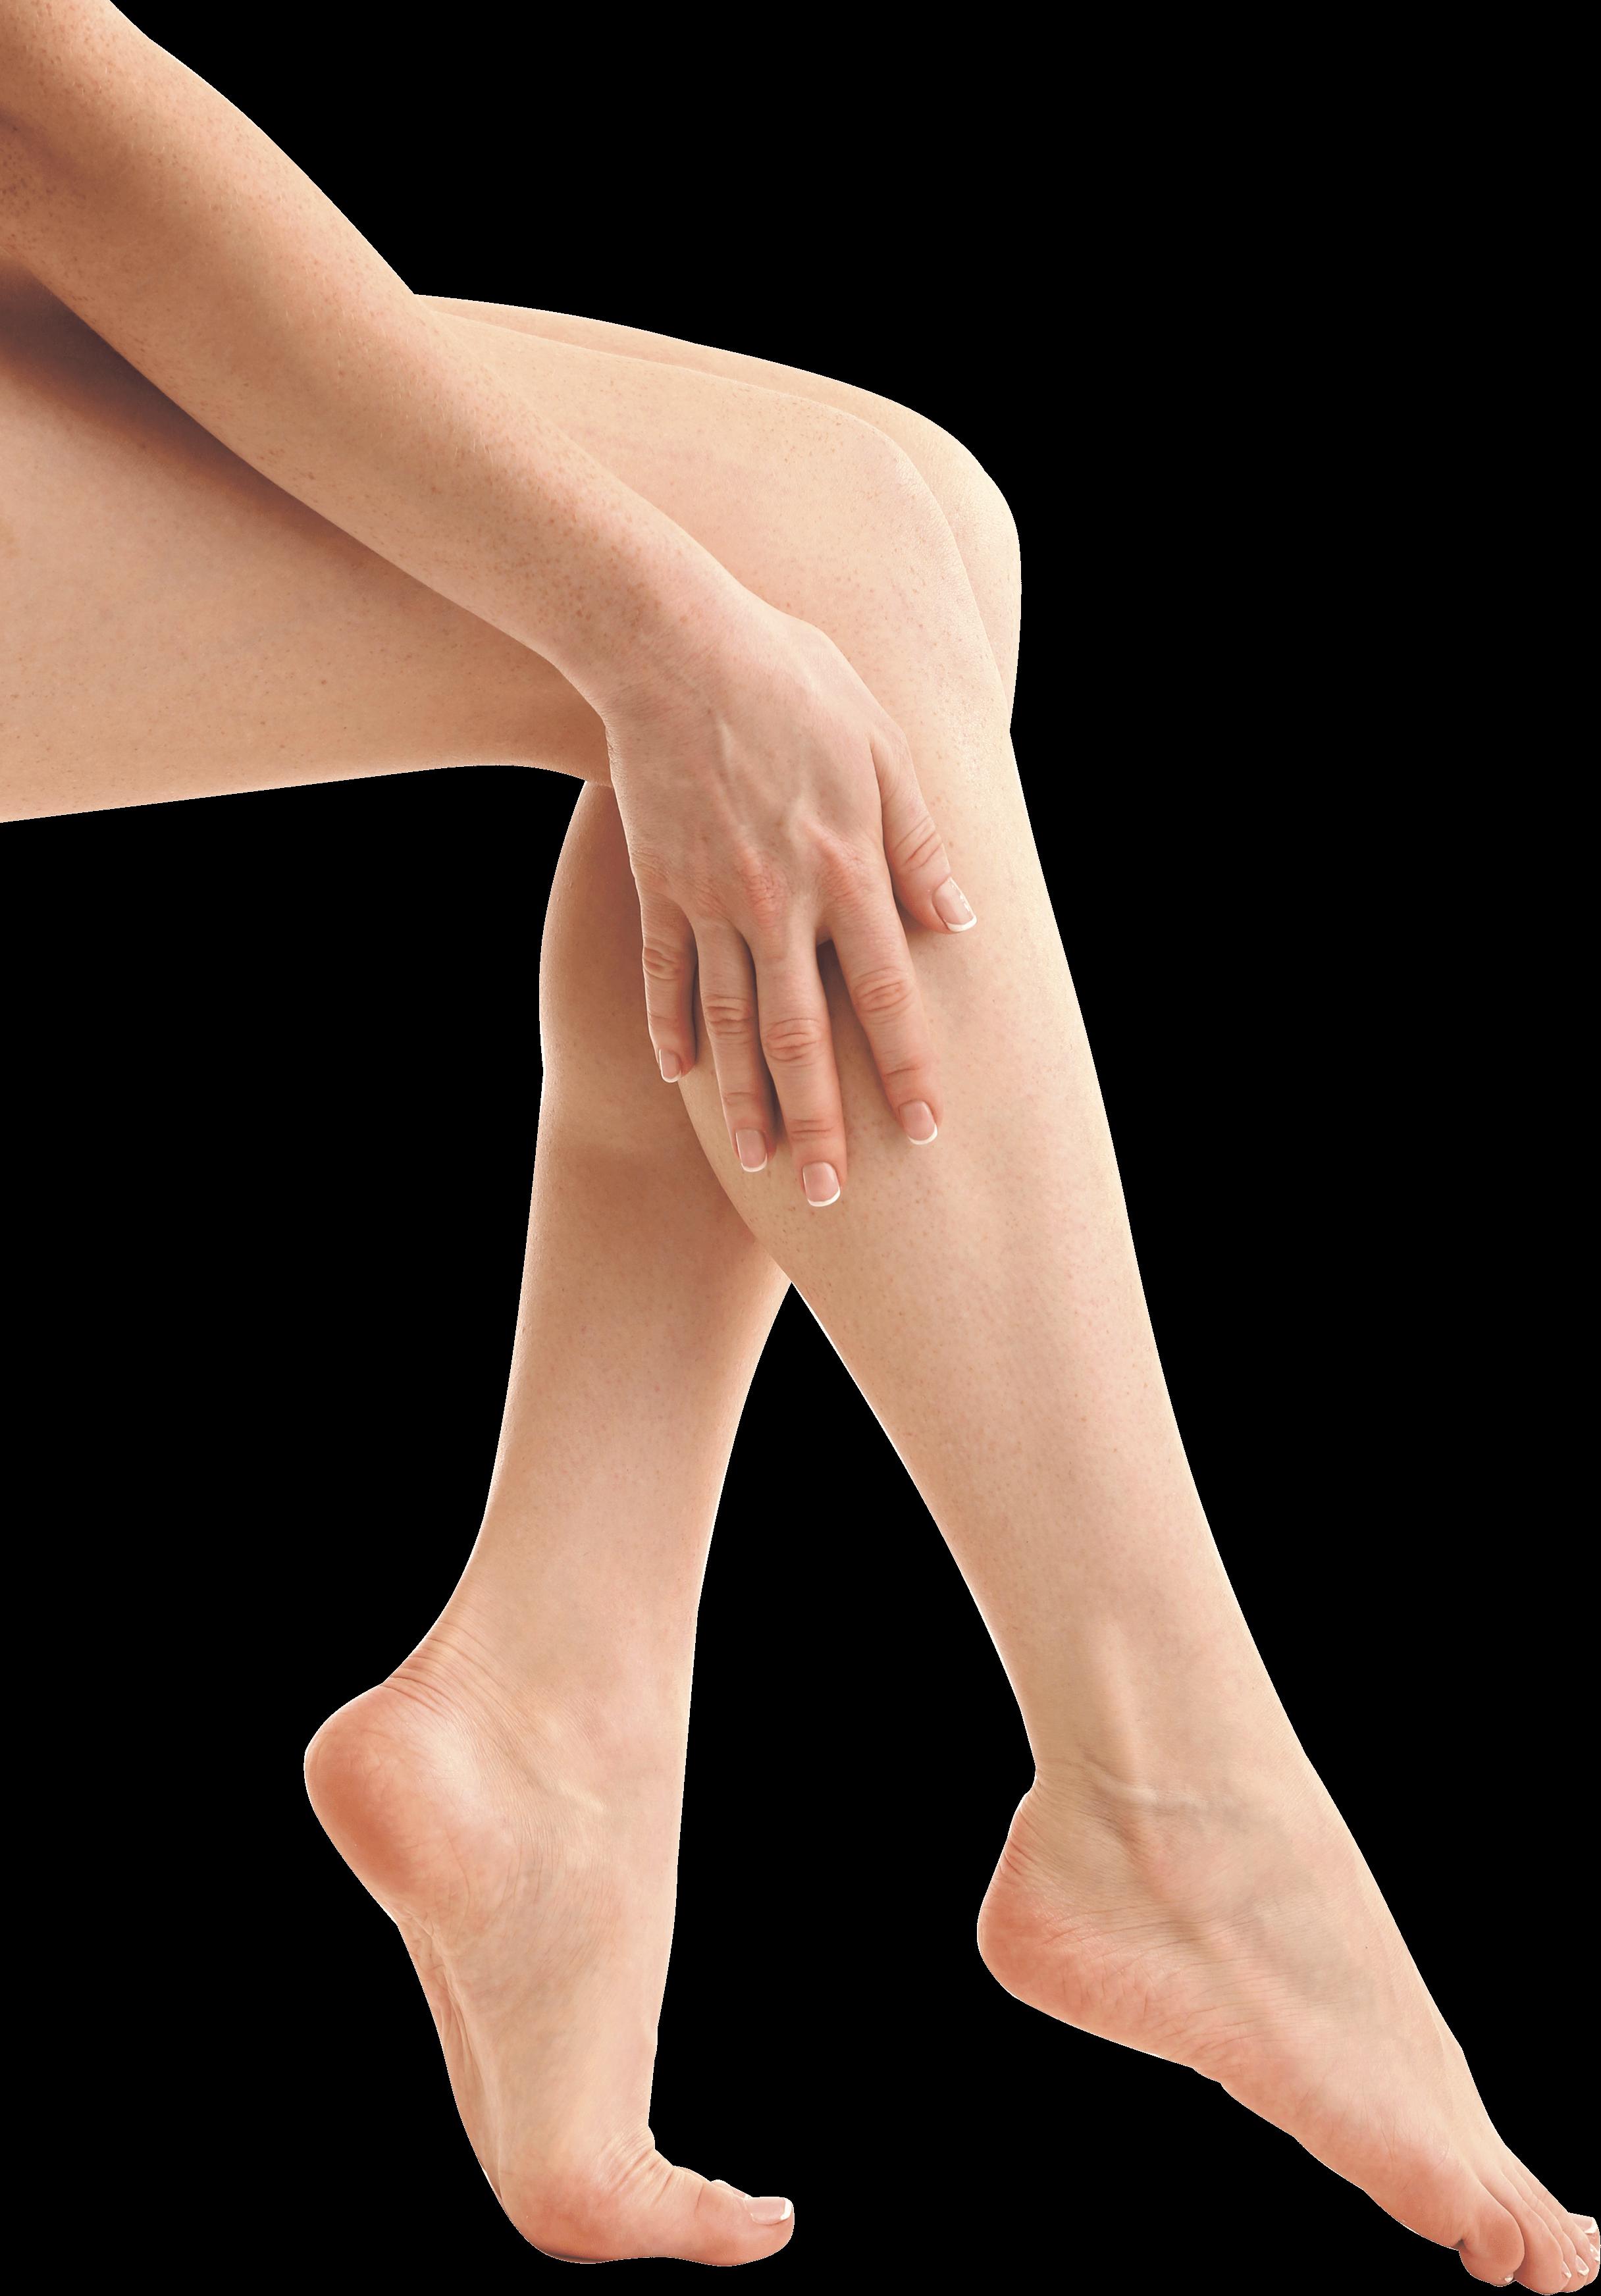 Female Leg Transparent Background